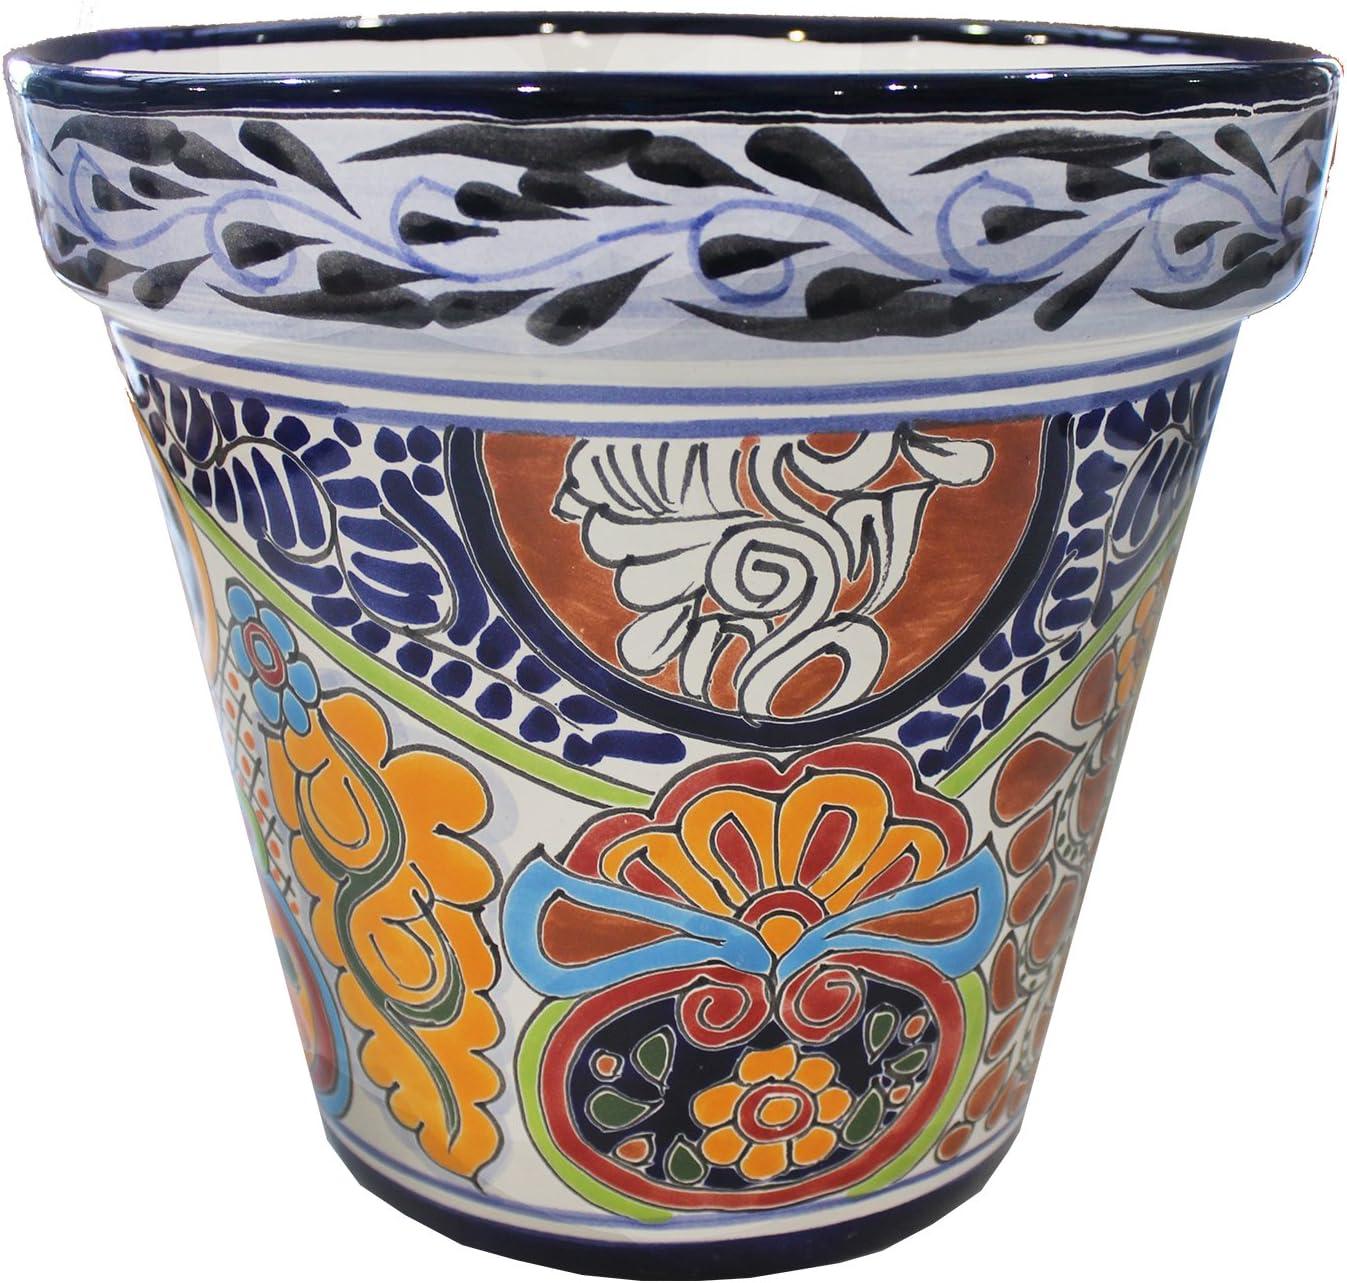 Tierra Fina Talavera Standard Pot – 10.50 Diameter x 10 High